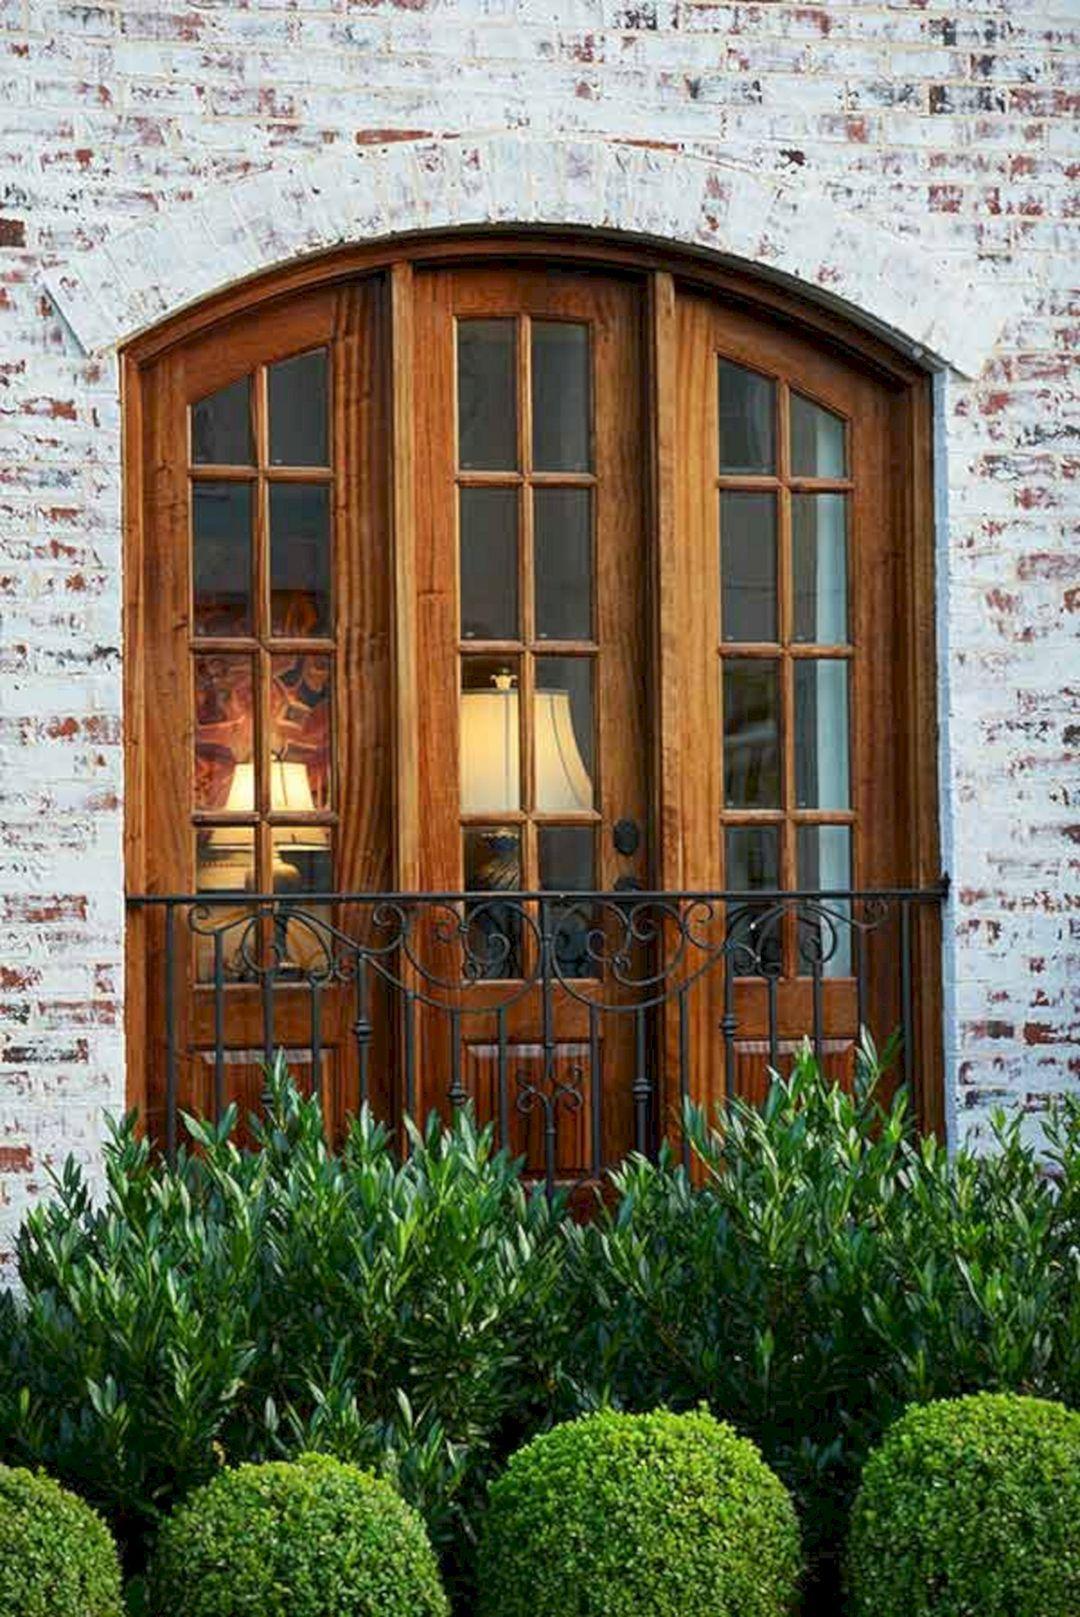 Top 5 Elegant French Country Home Architecture Ideas Freshouz Com Farmhouse Exterior French Country House House Exterior